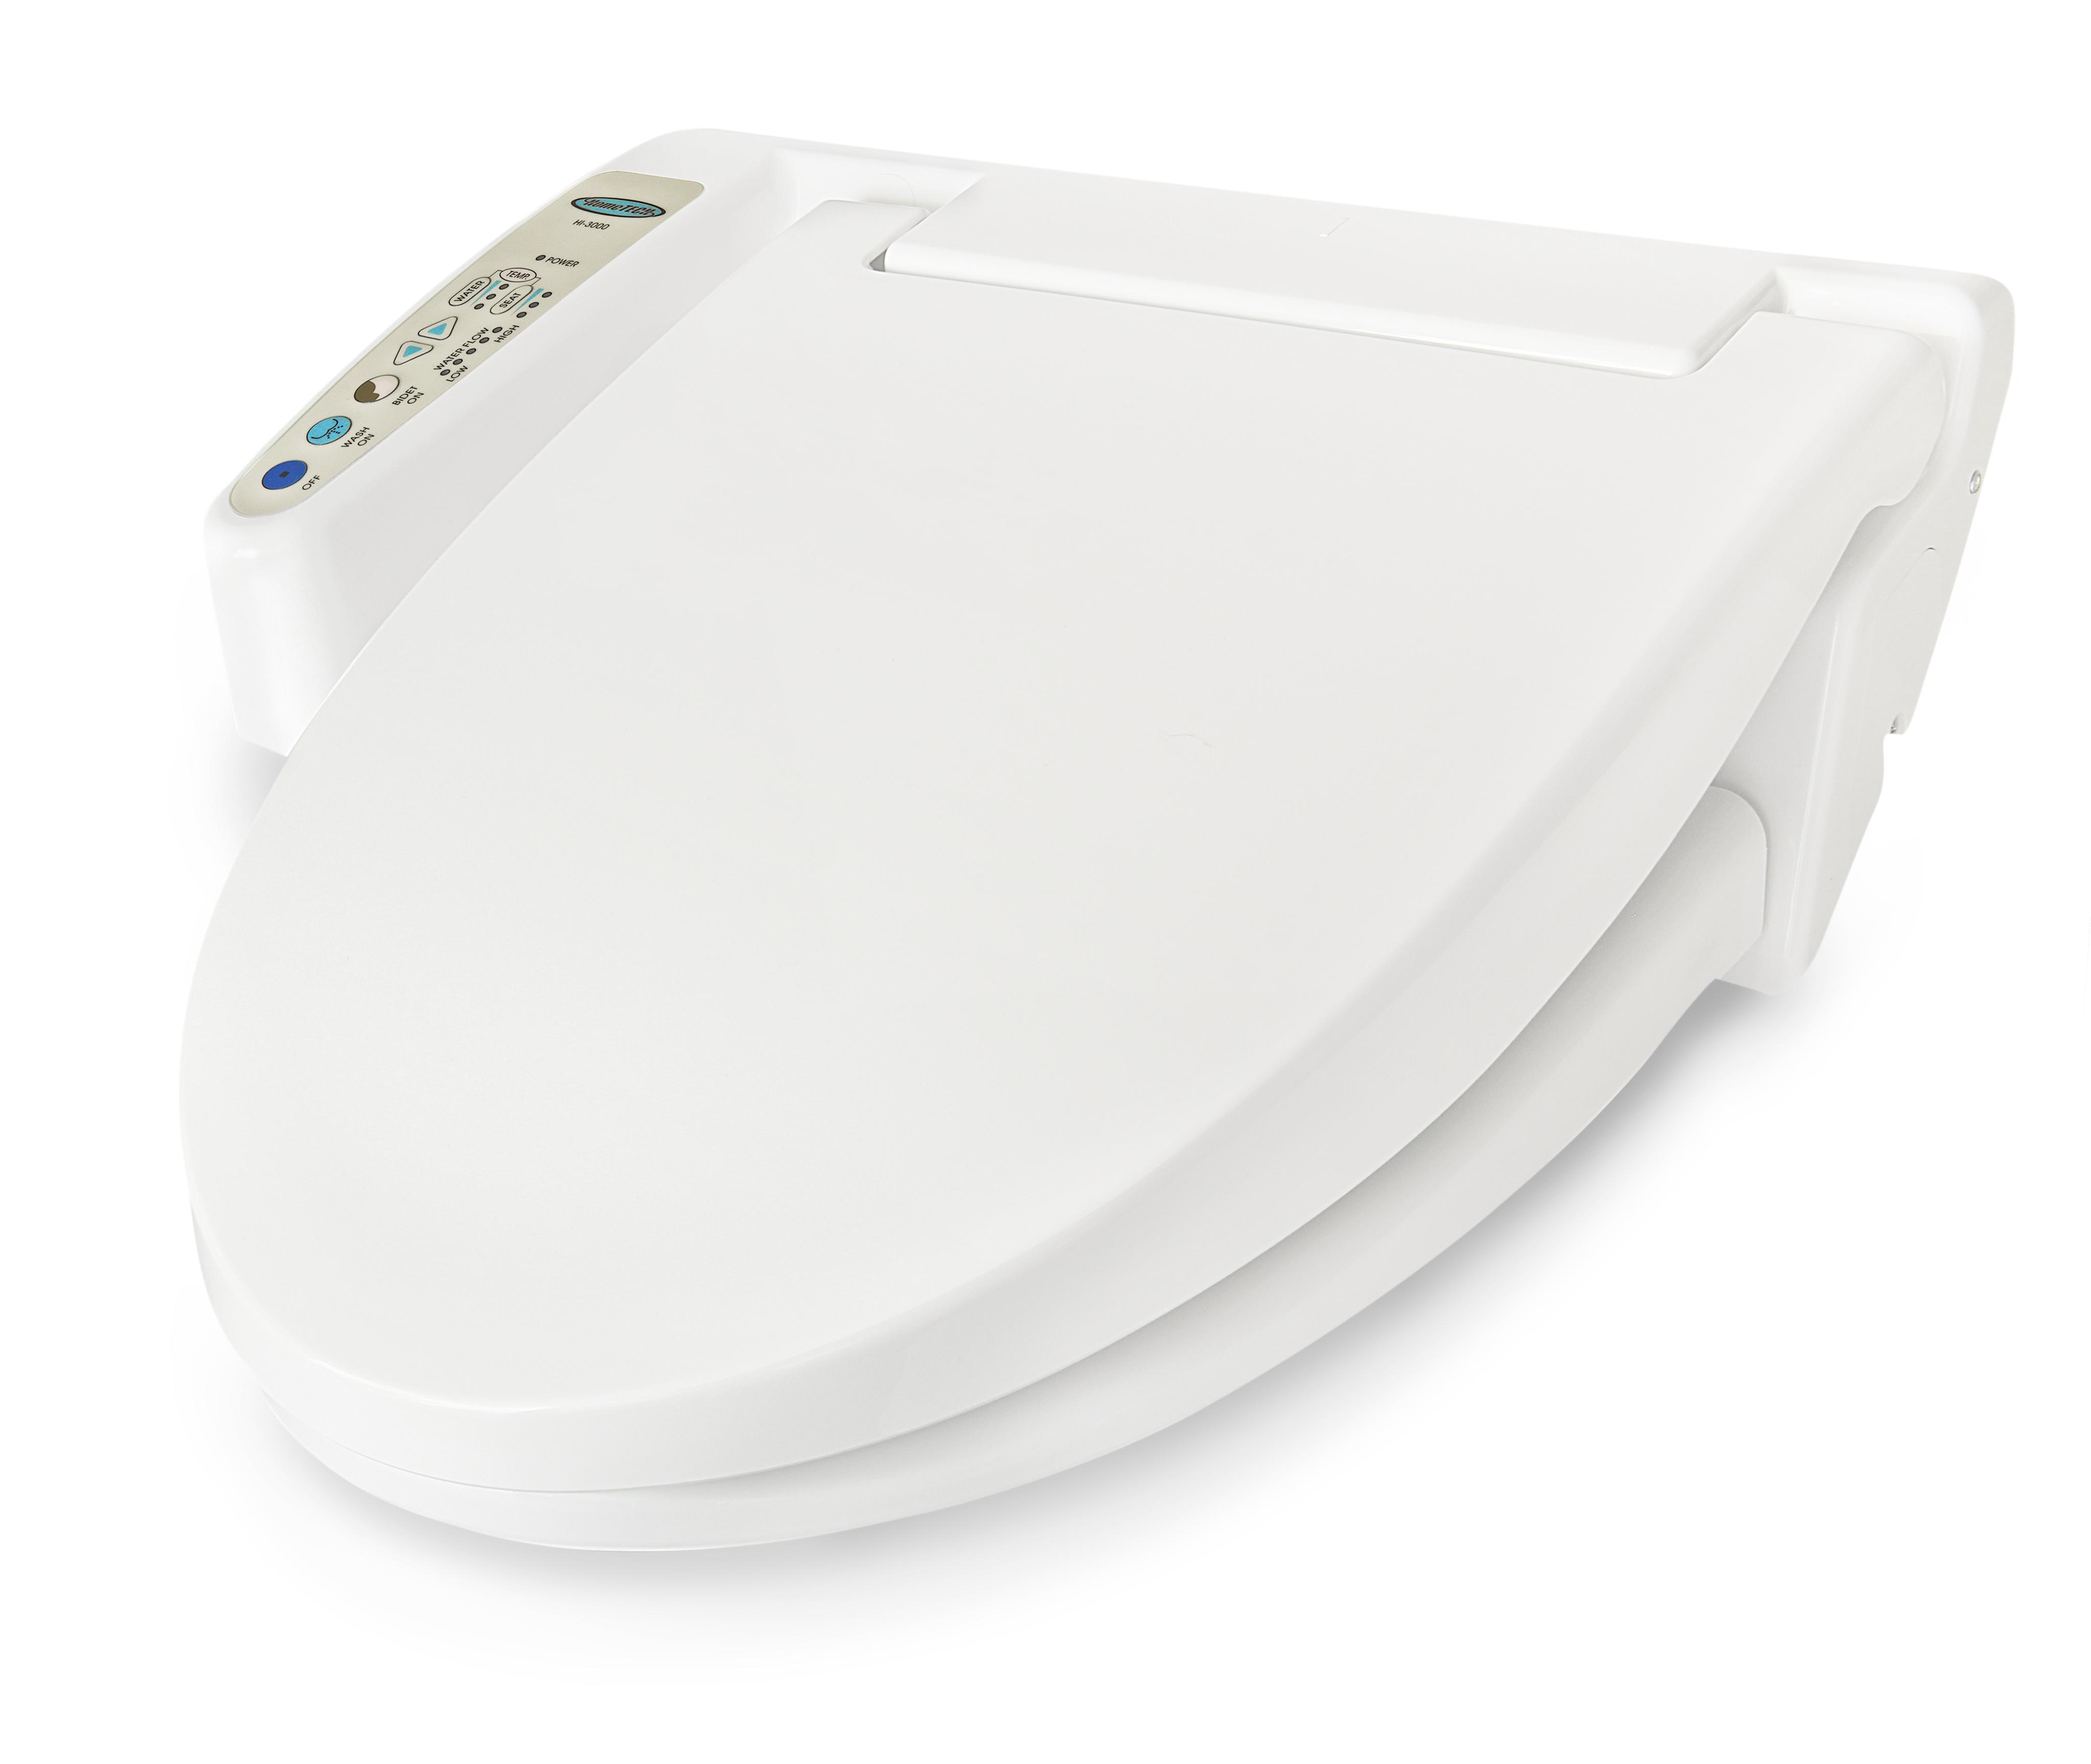 HomeTech HI 3000 Bidet Toilet Seat